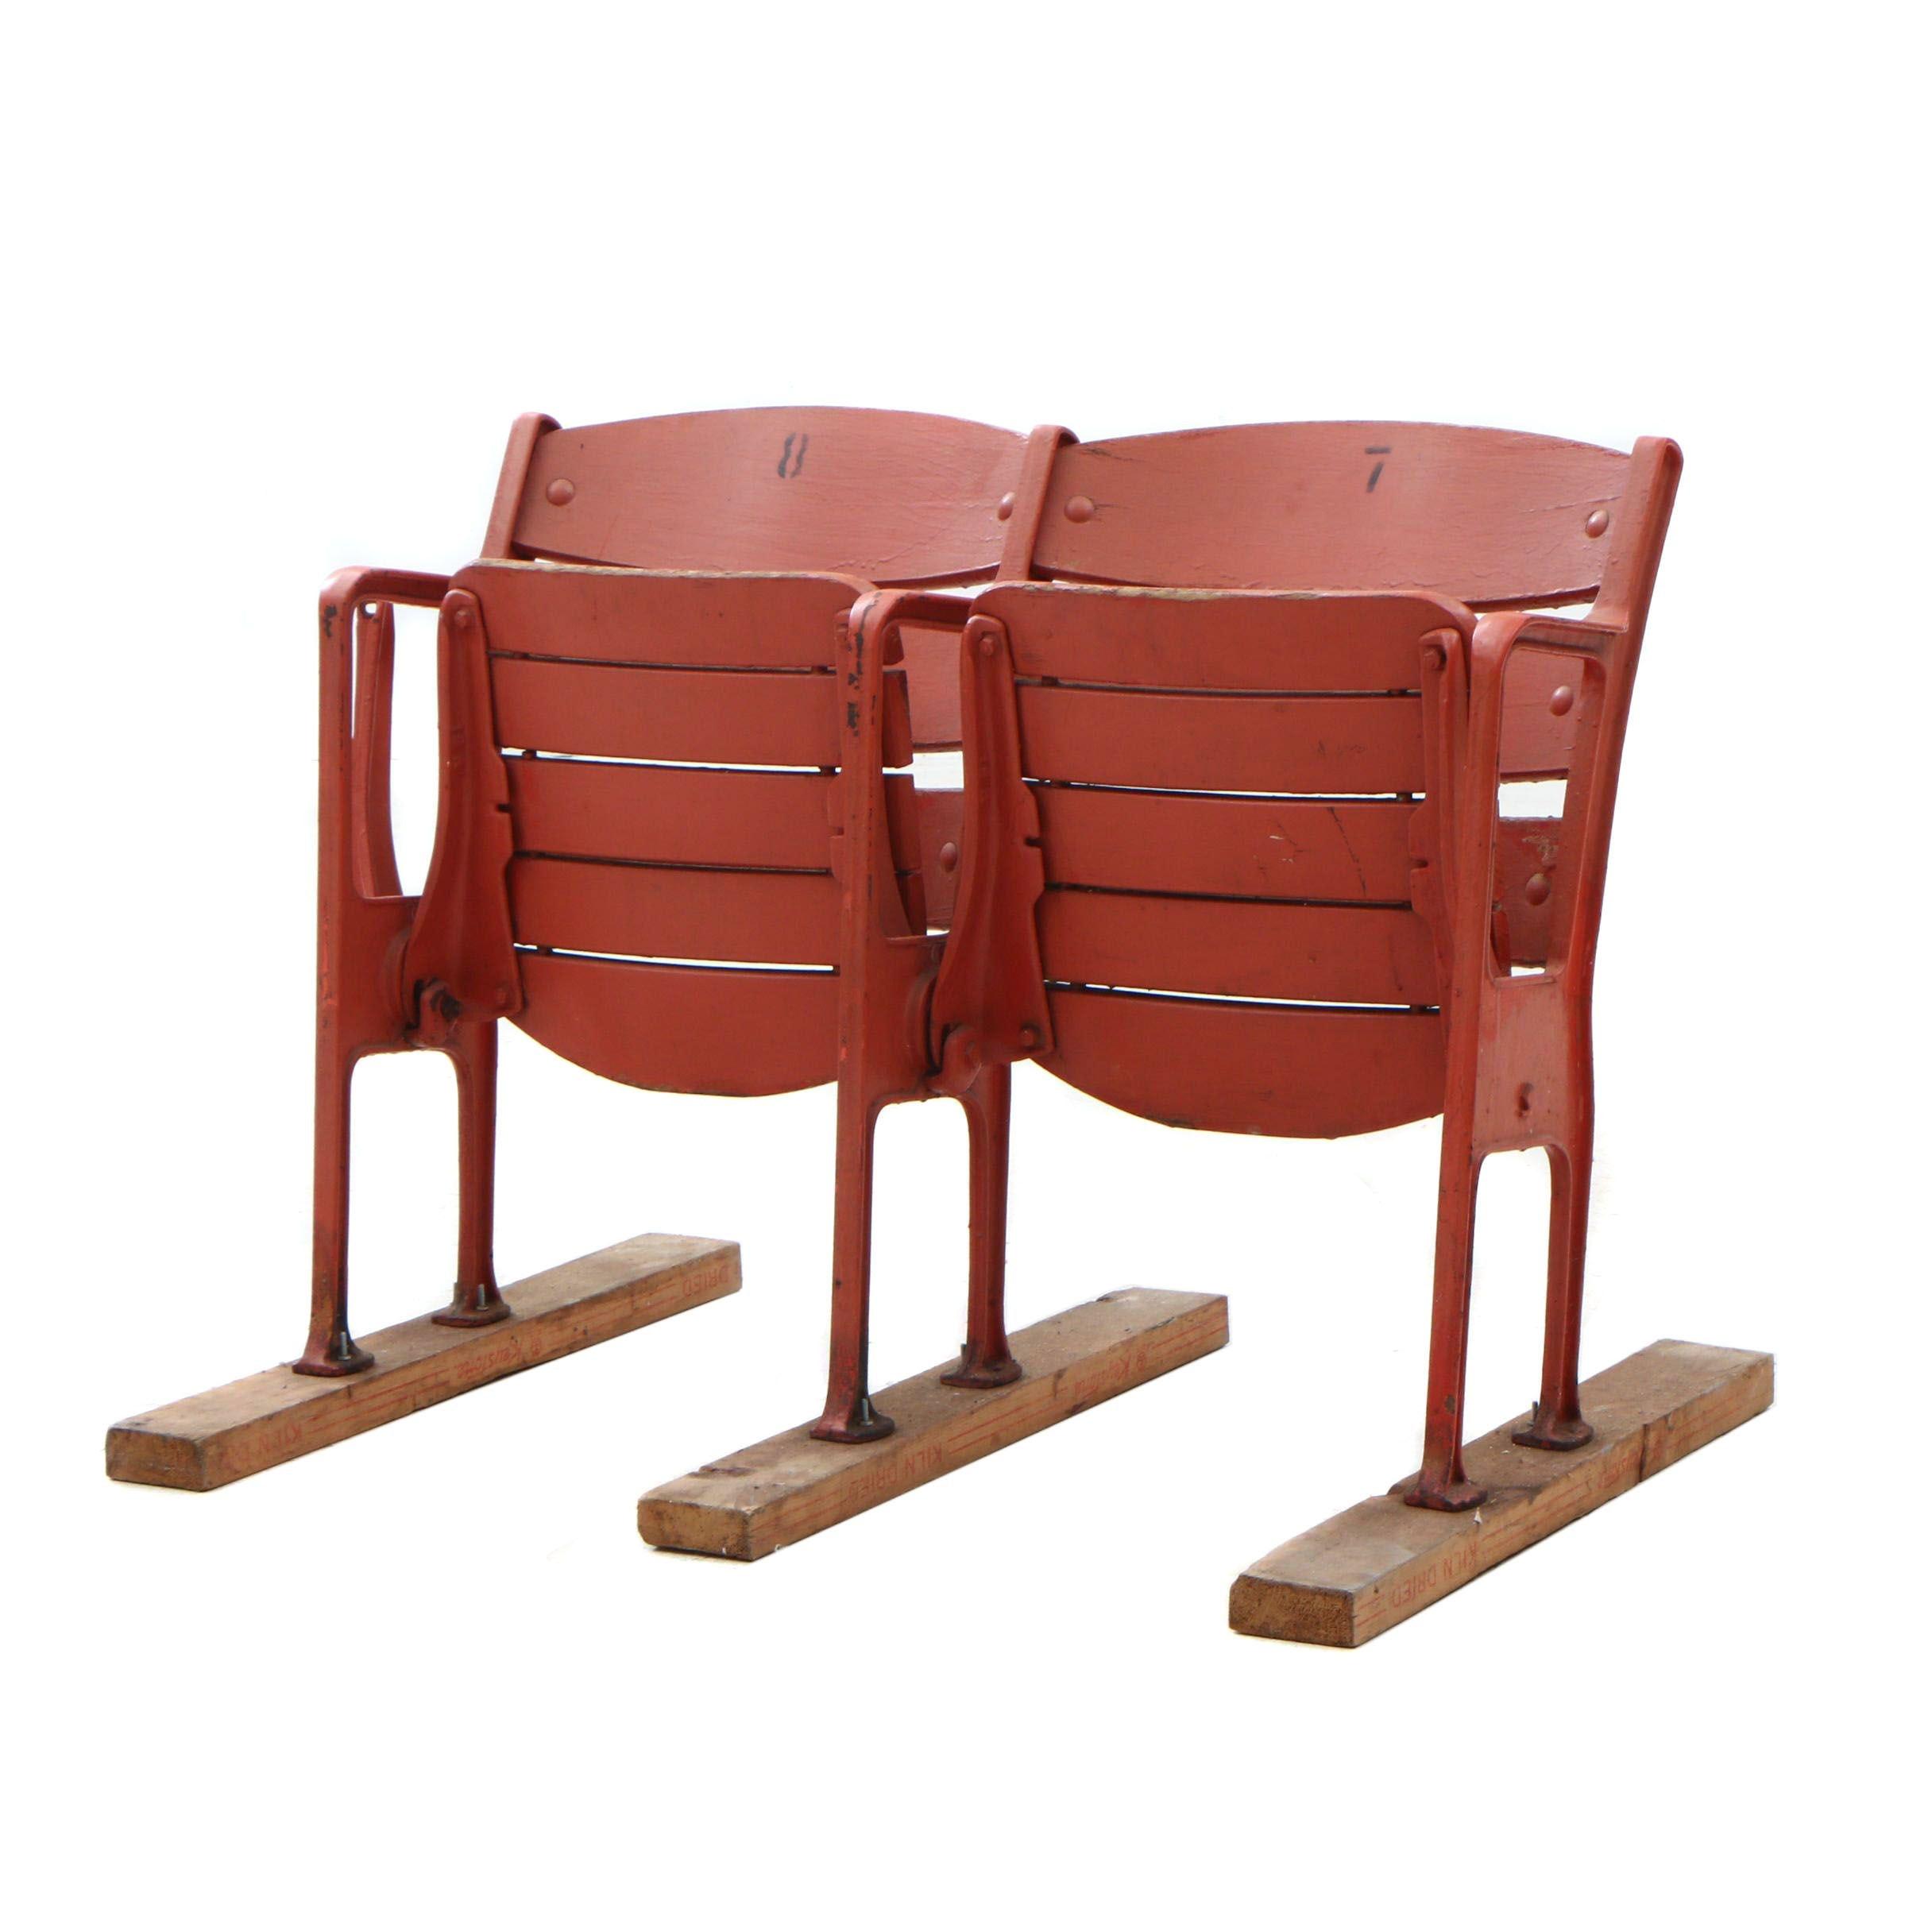 Cincinnati Crosley Field Stadium Self-Standing Seats